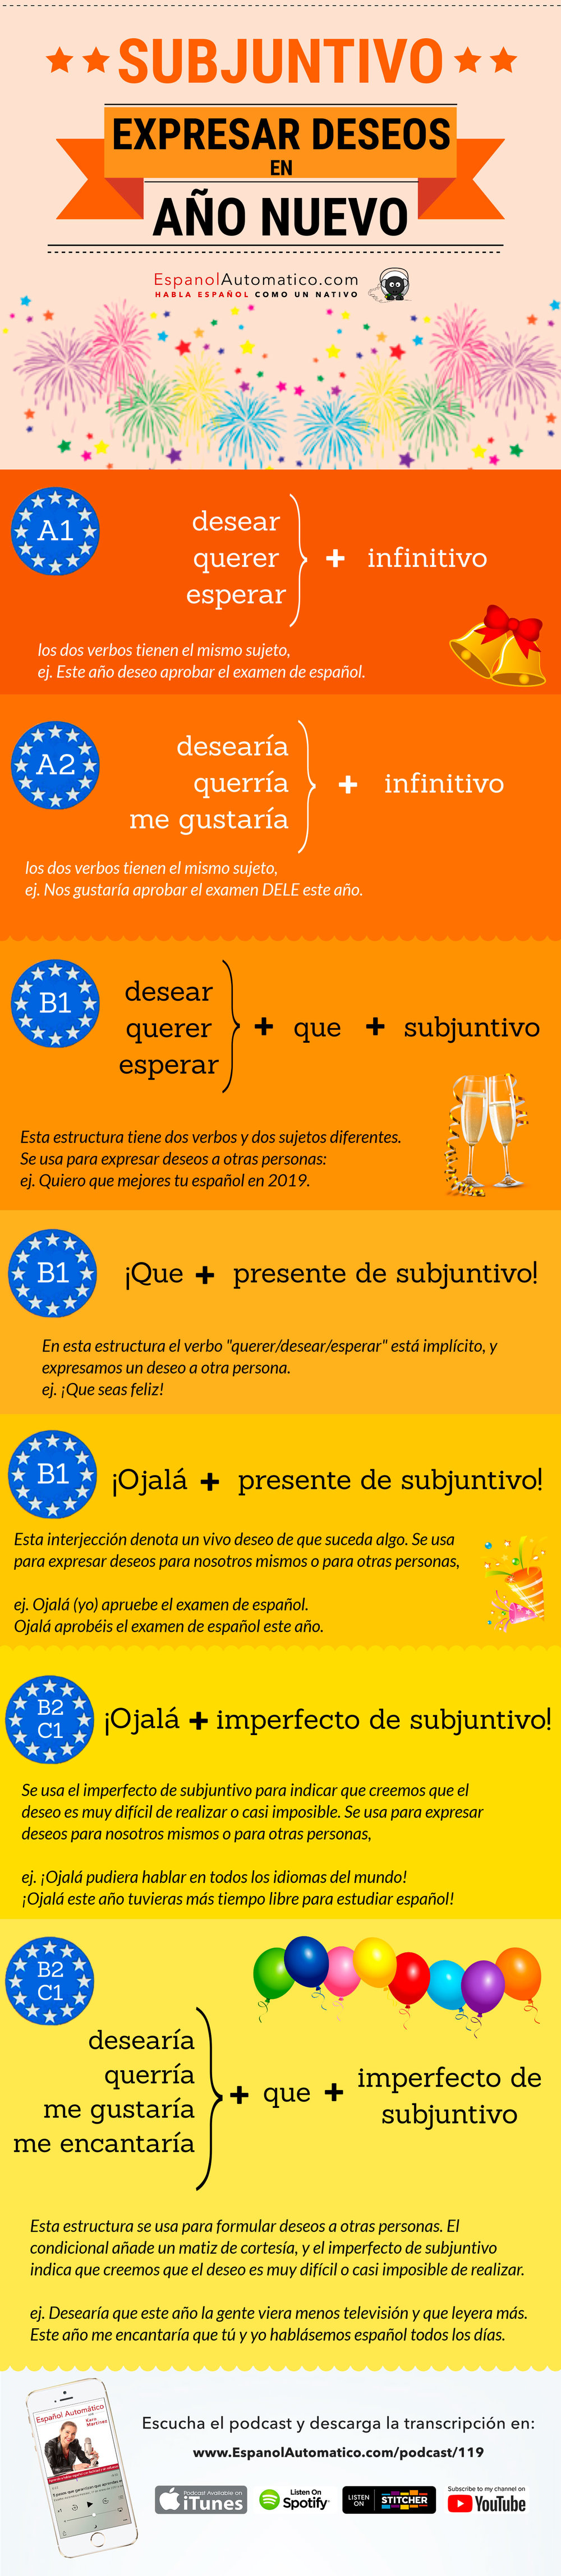 Expresar deseos en español (A1-C1) | subjuntivo en español  (podcast)  👉 http://espanolautomatico.com/podcast/119   🇪🇸 🇪🇸 #learnspanish #spanish #hiszpanski #spanska  #apprendreespagnol  #スペイン語 #foghlaimspáinnis  #study #subjuntive #elsubjuntivo #gramatica